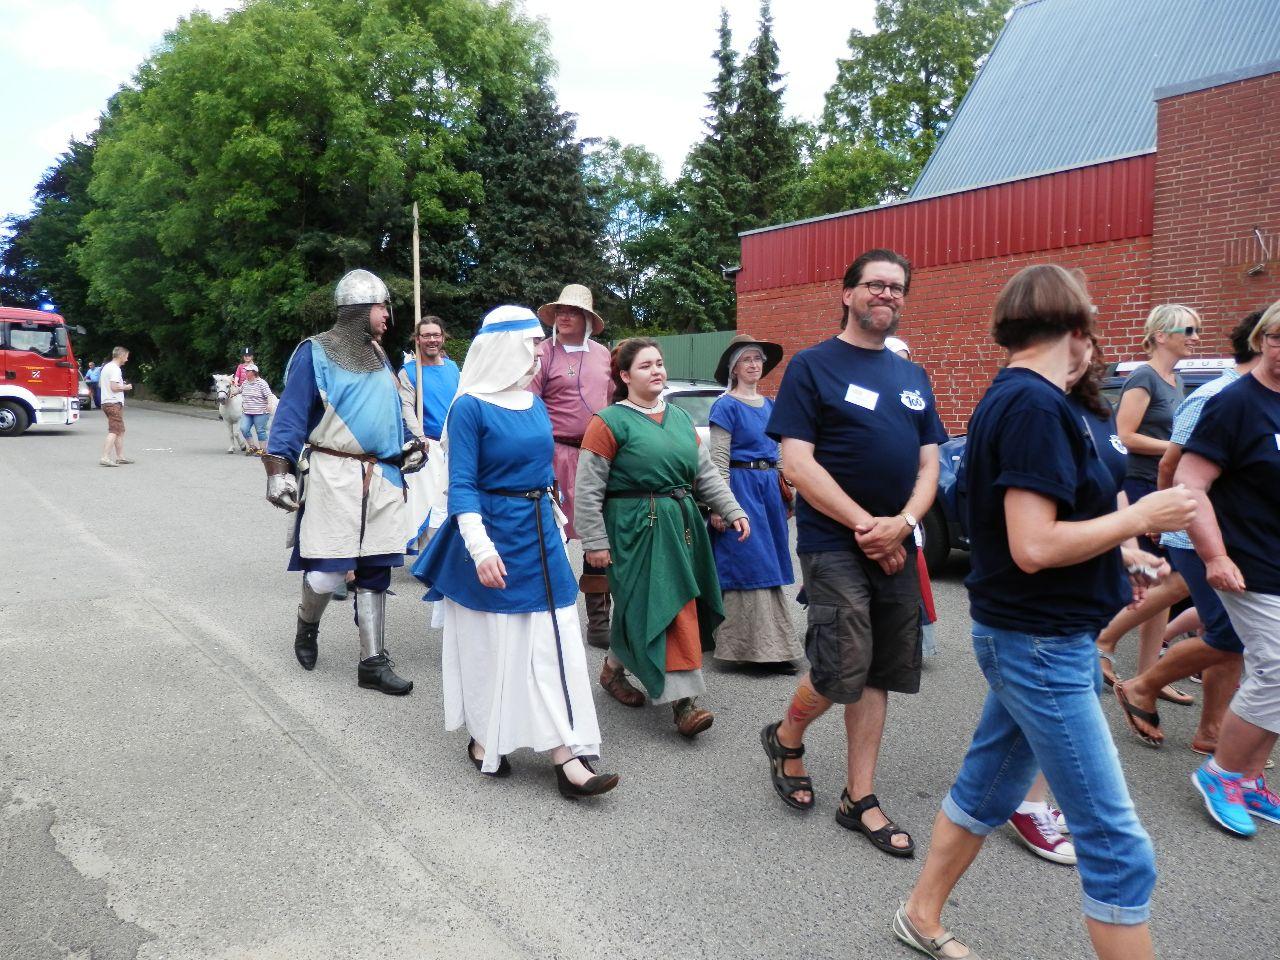 Mittelalter-Flair im Zug